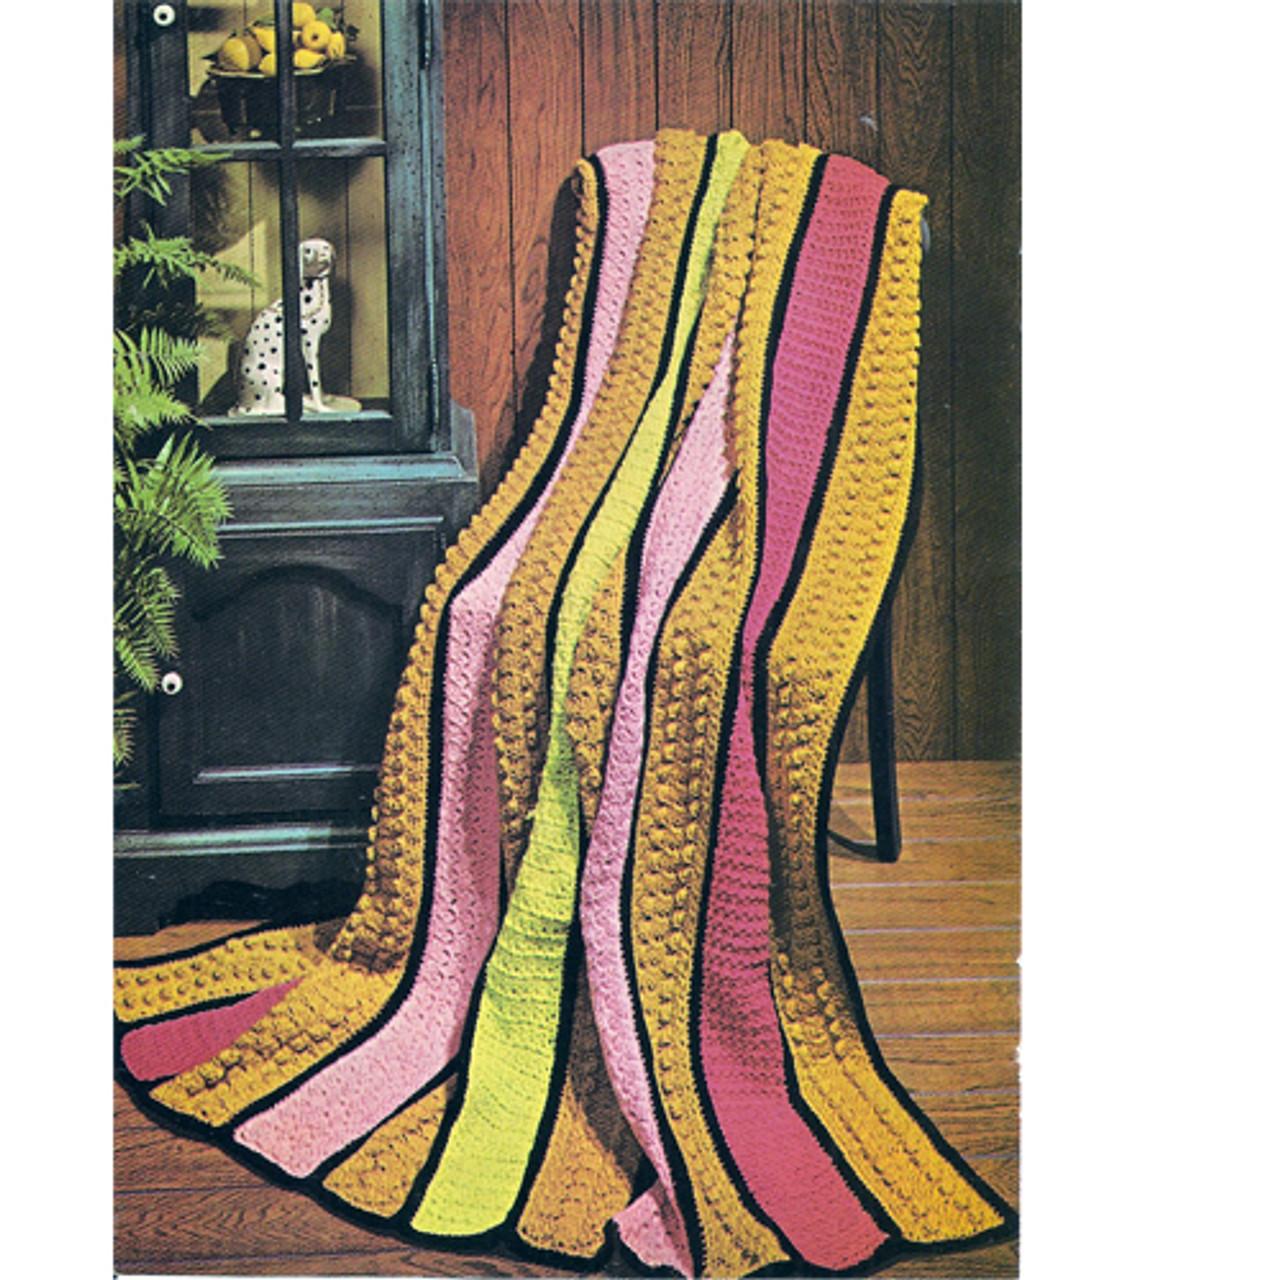 Vintage Crochet Afghan Pattern, colorful Stripes in popcorn stitch